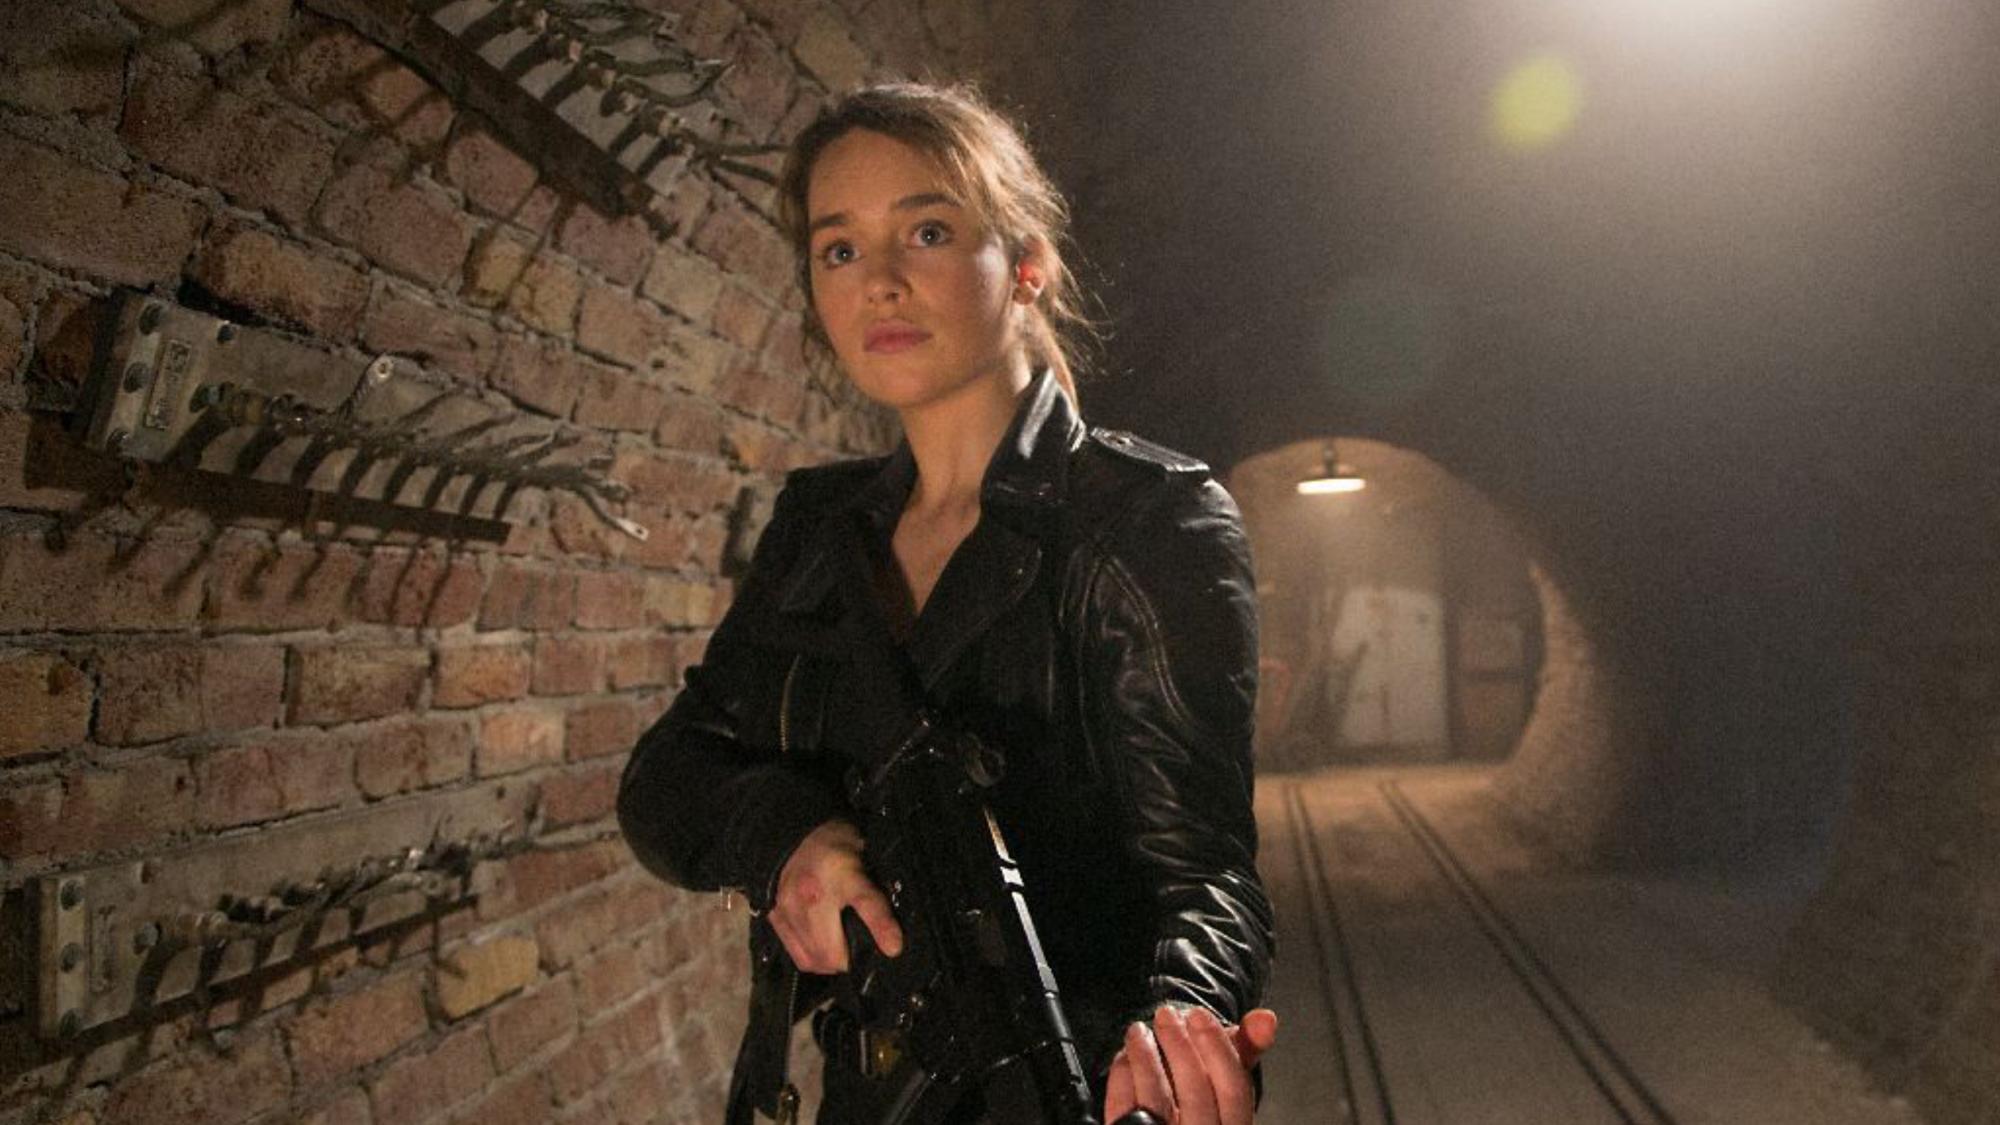 Terminator genisys skynet 39 s army terminator fans - Sarah connor genisys actress ...